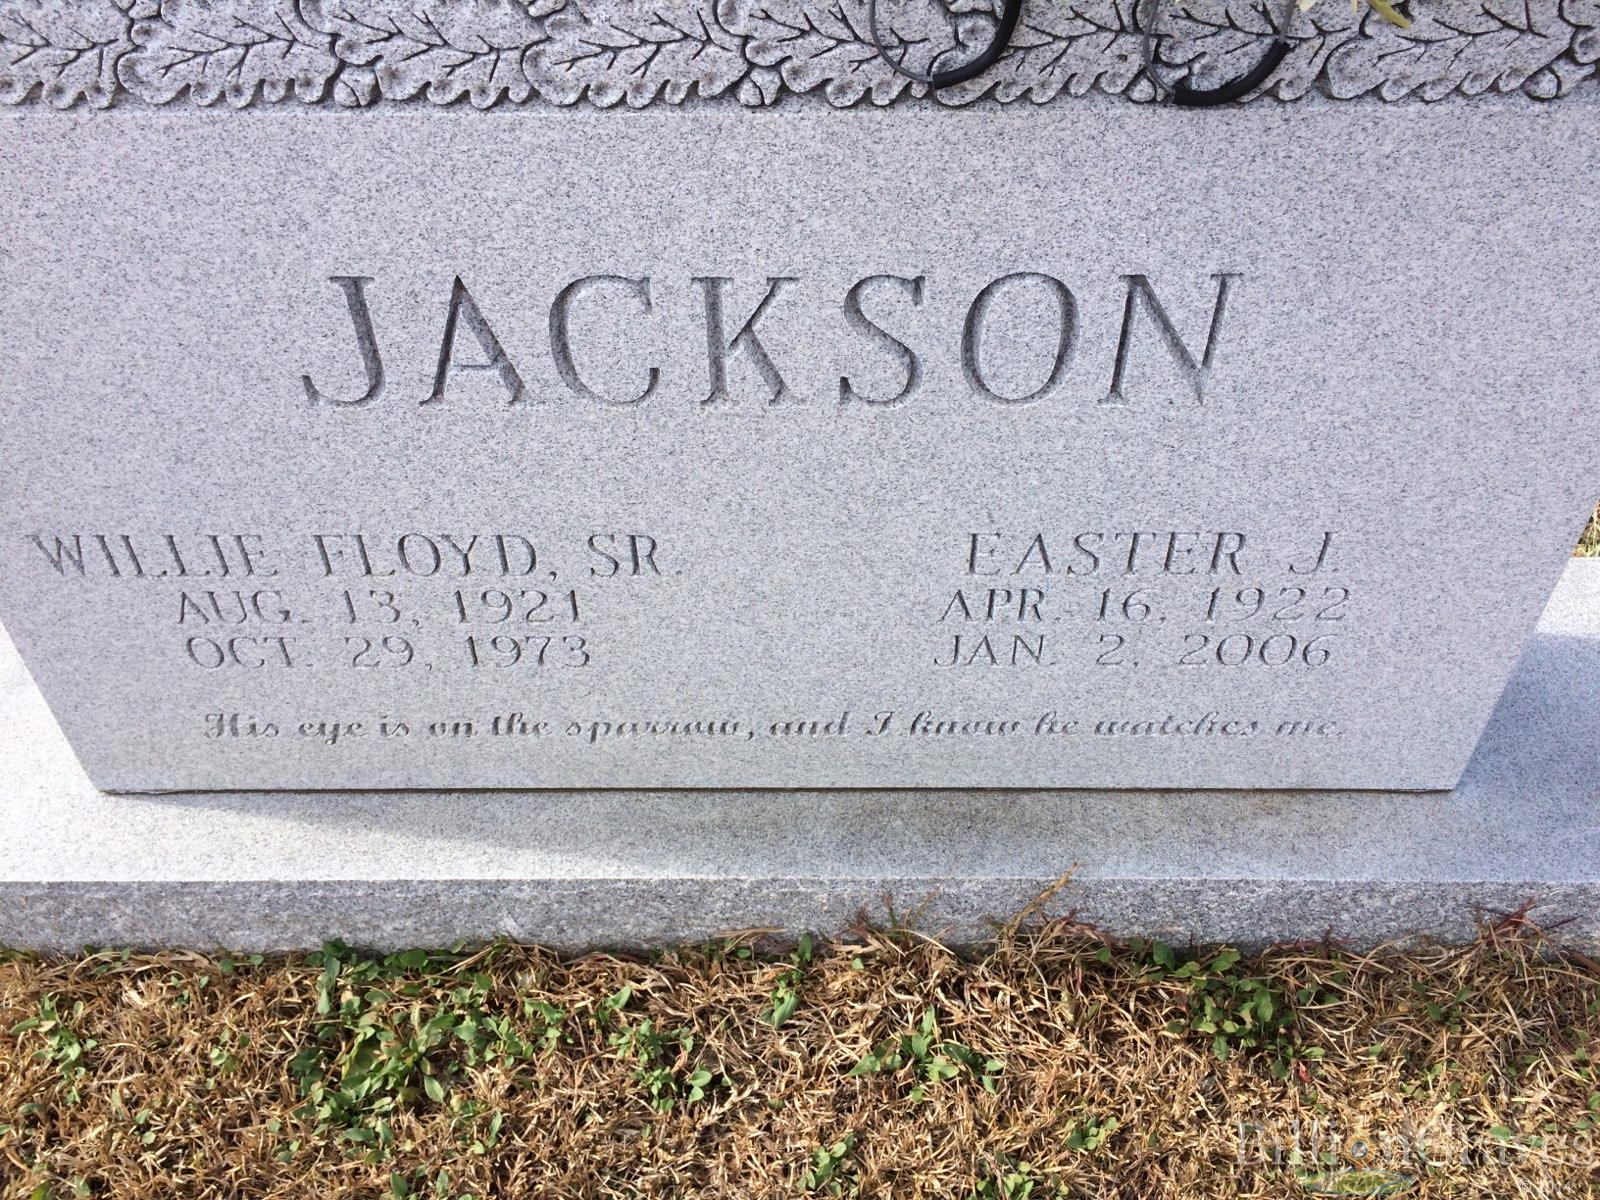 grave site of willie floyd jackson sr 1921 1973 billiongraves headstone image of willie floyd jackson sr